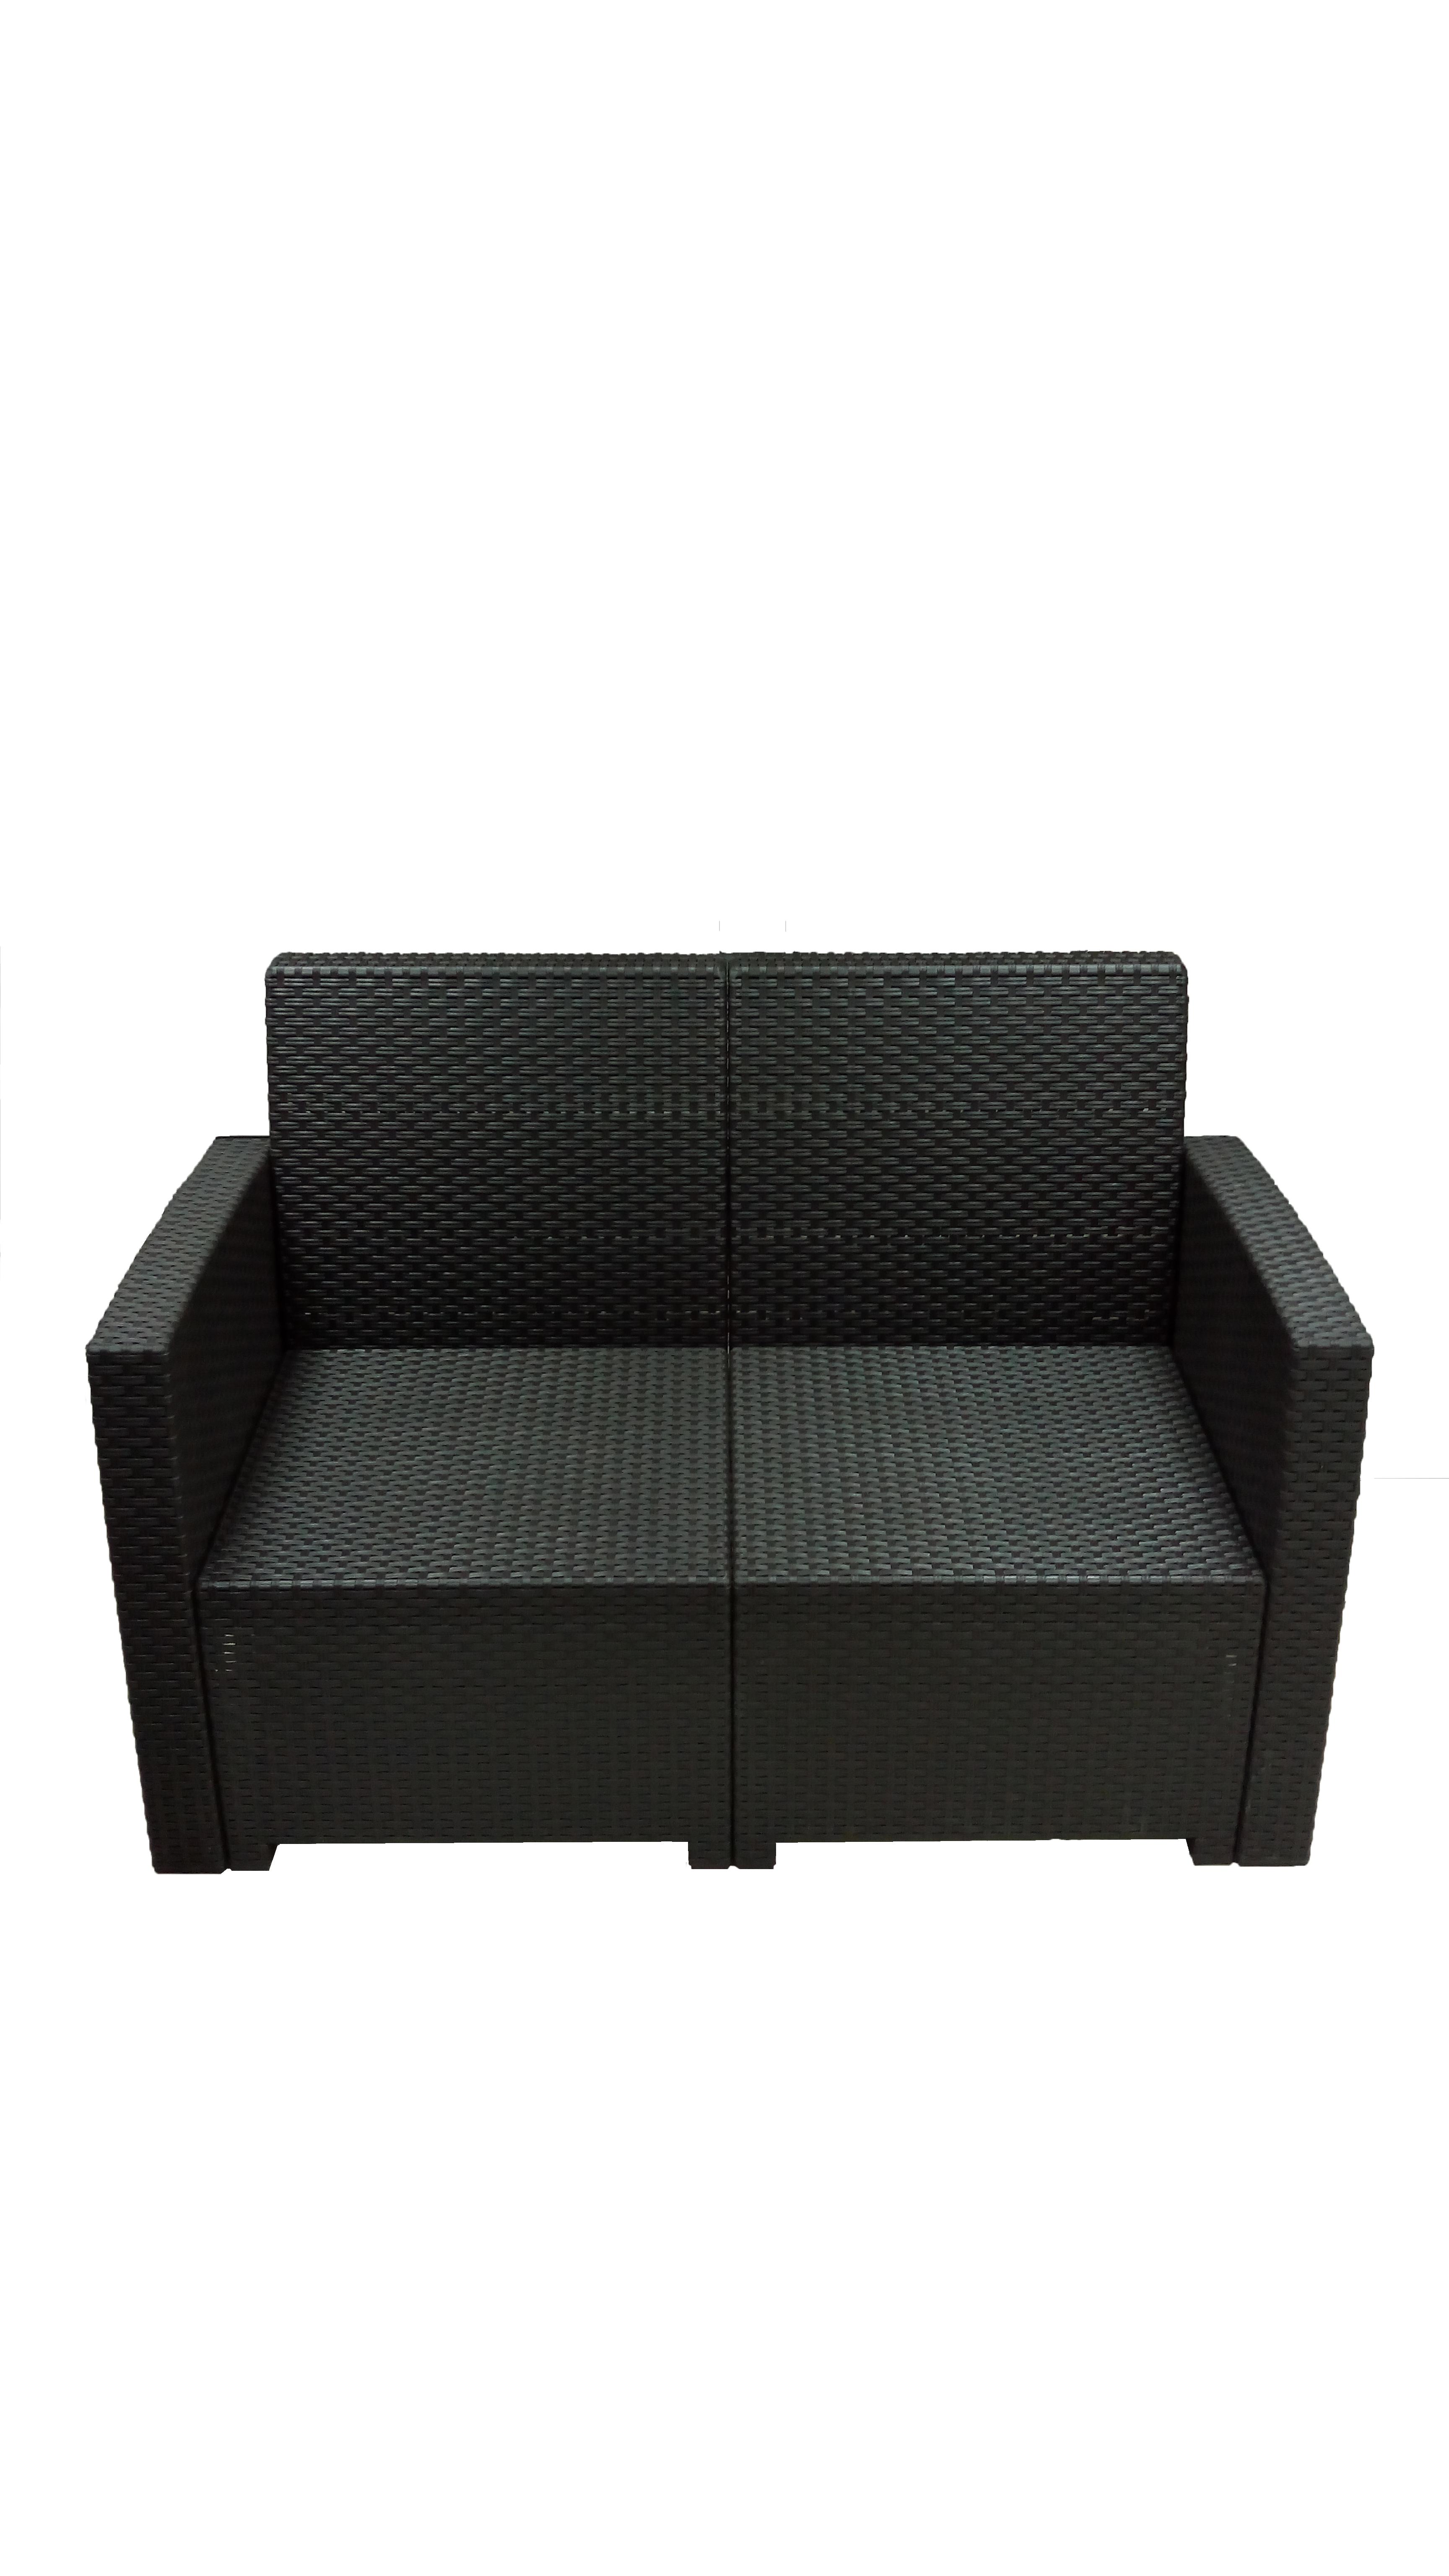 Home Office Sofa Set